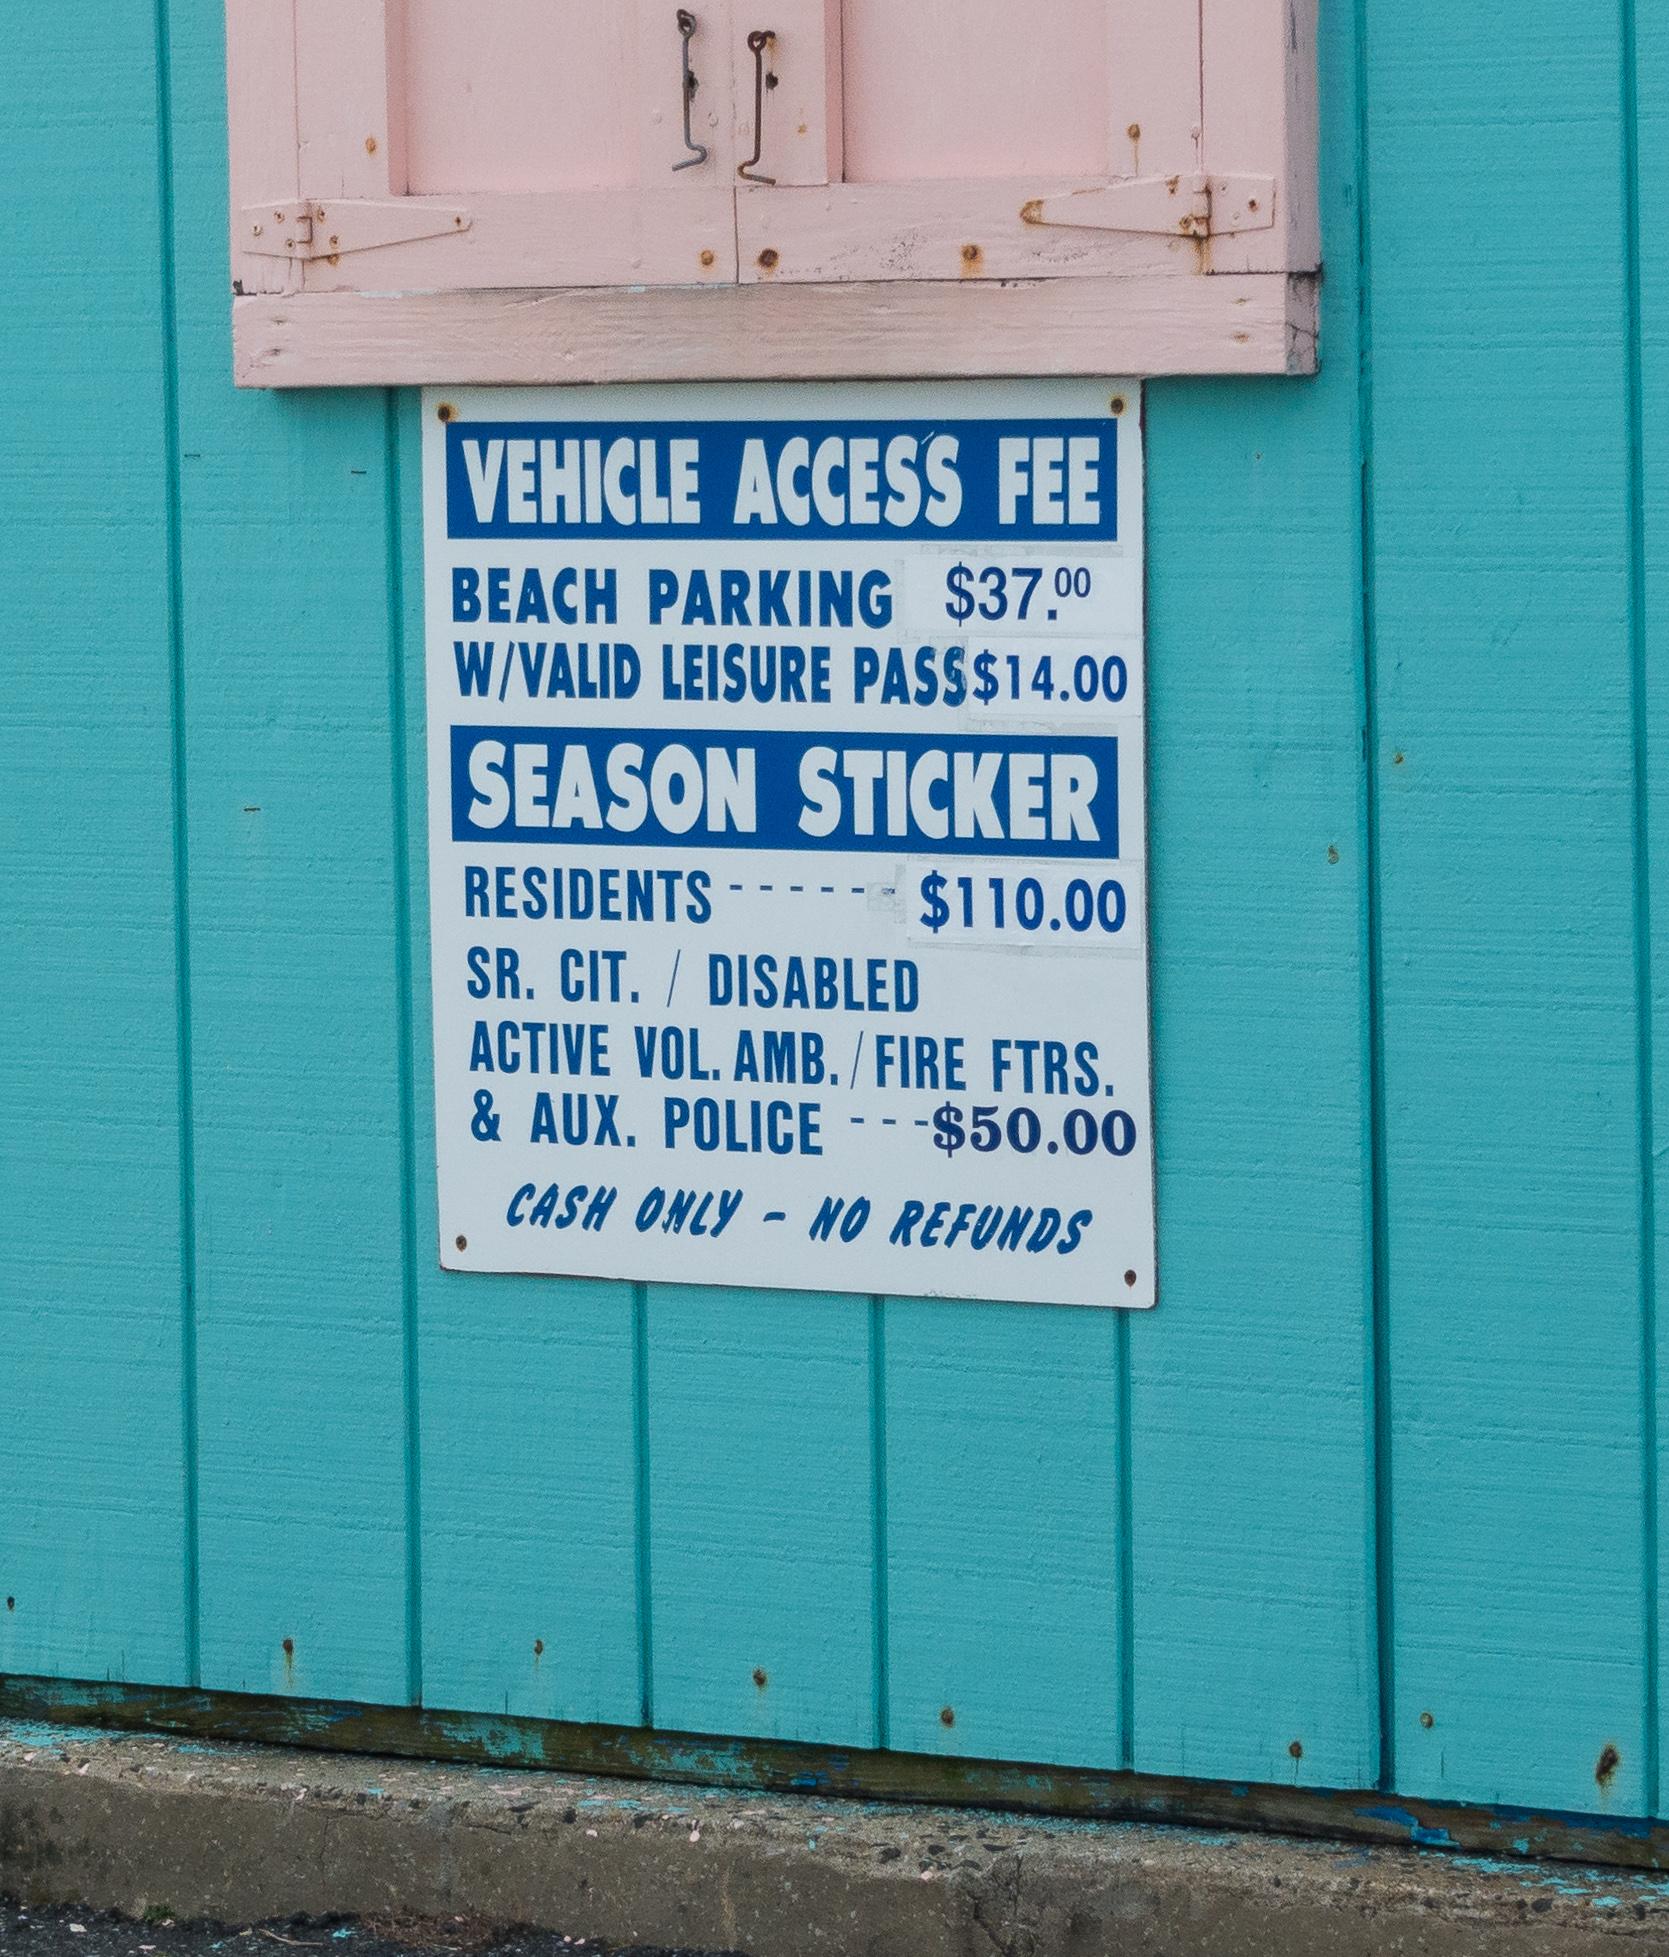 Entrance fees as of Summer 2019 - Nickerson Beach, Long Island, New York, USA